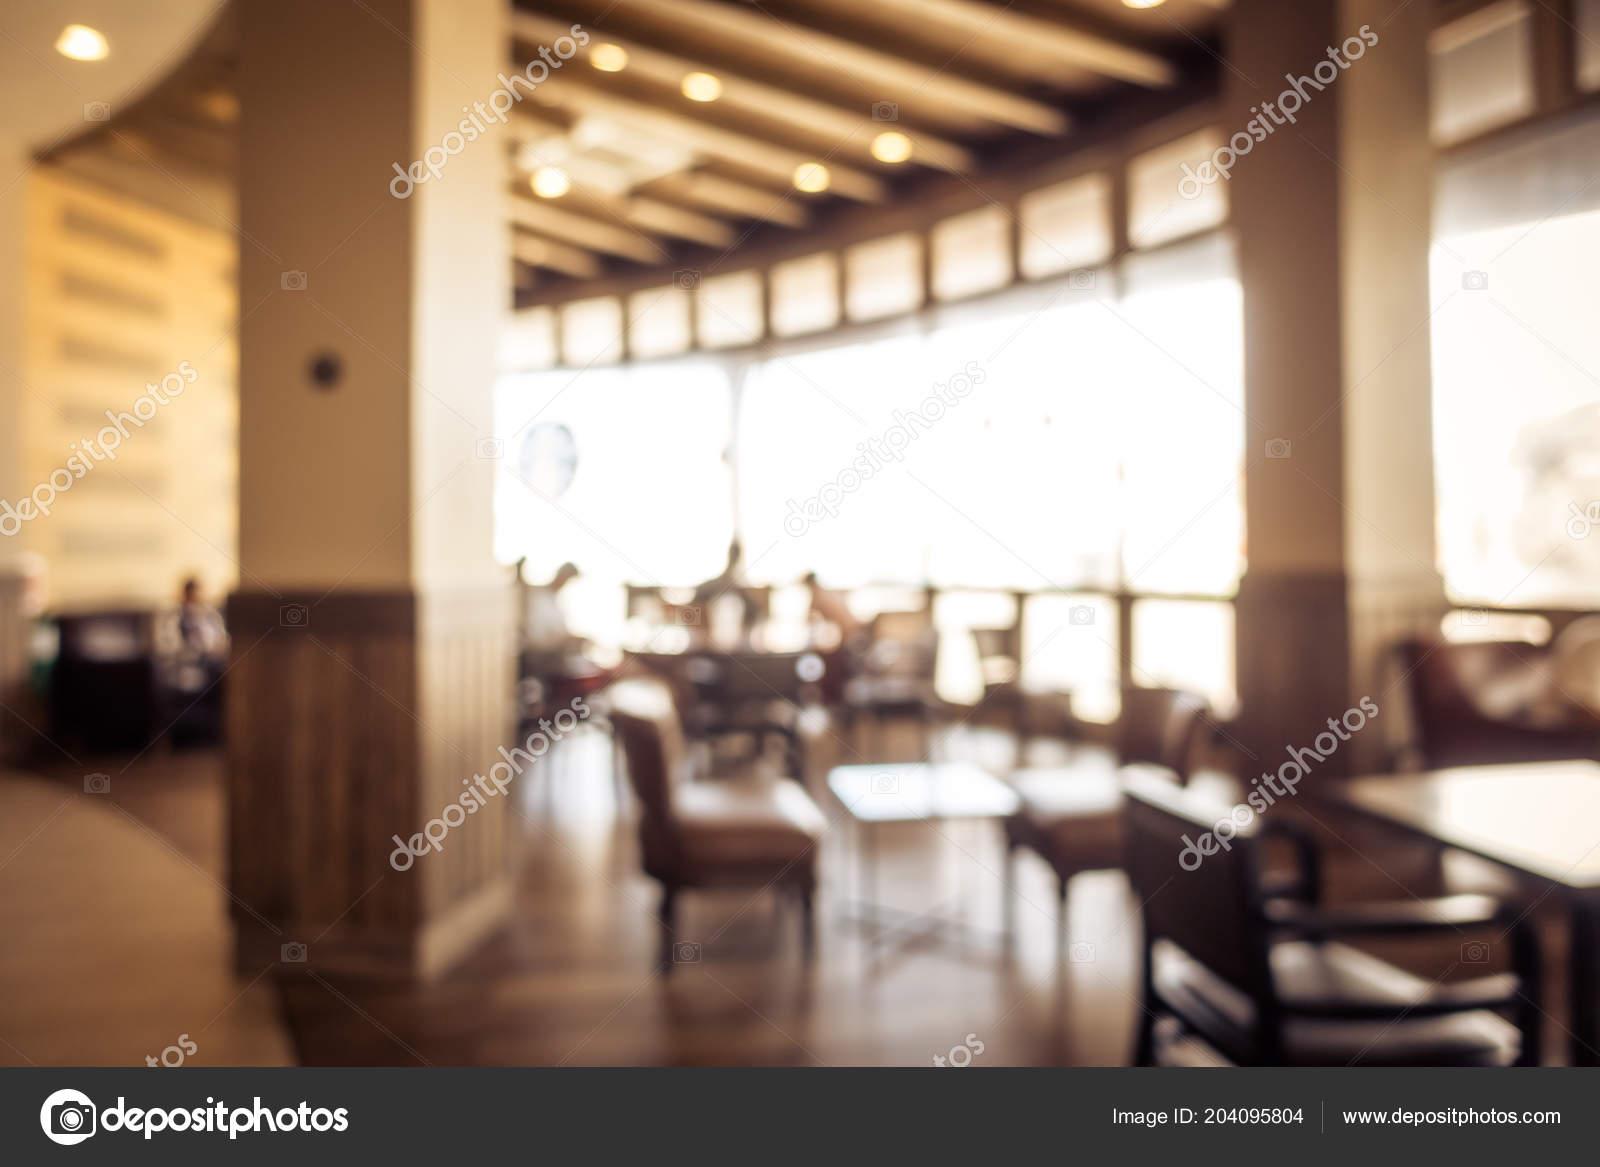 Abstract Blur Defocused Restaurant Coffee Shop Interior Background